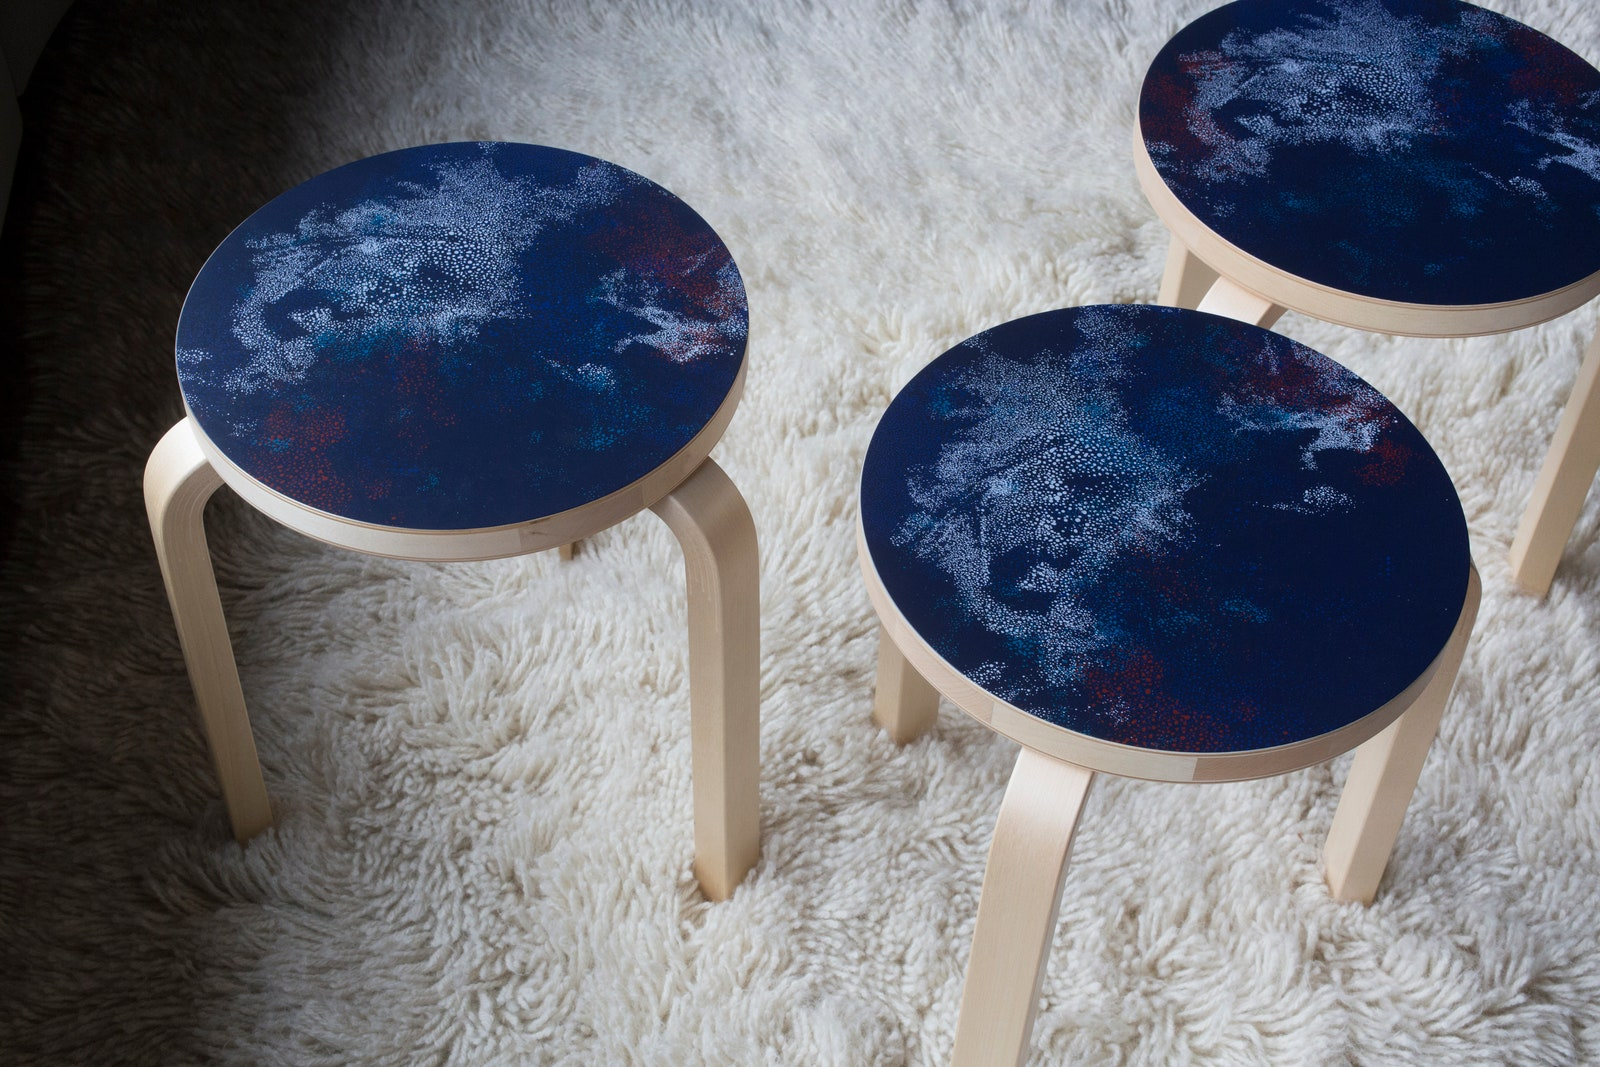 Artek  Heath Ceramics